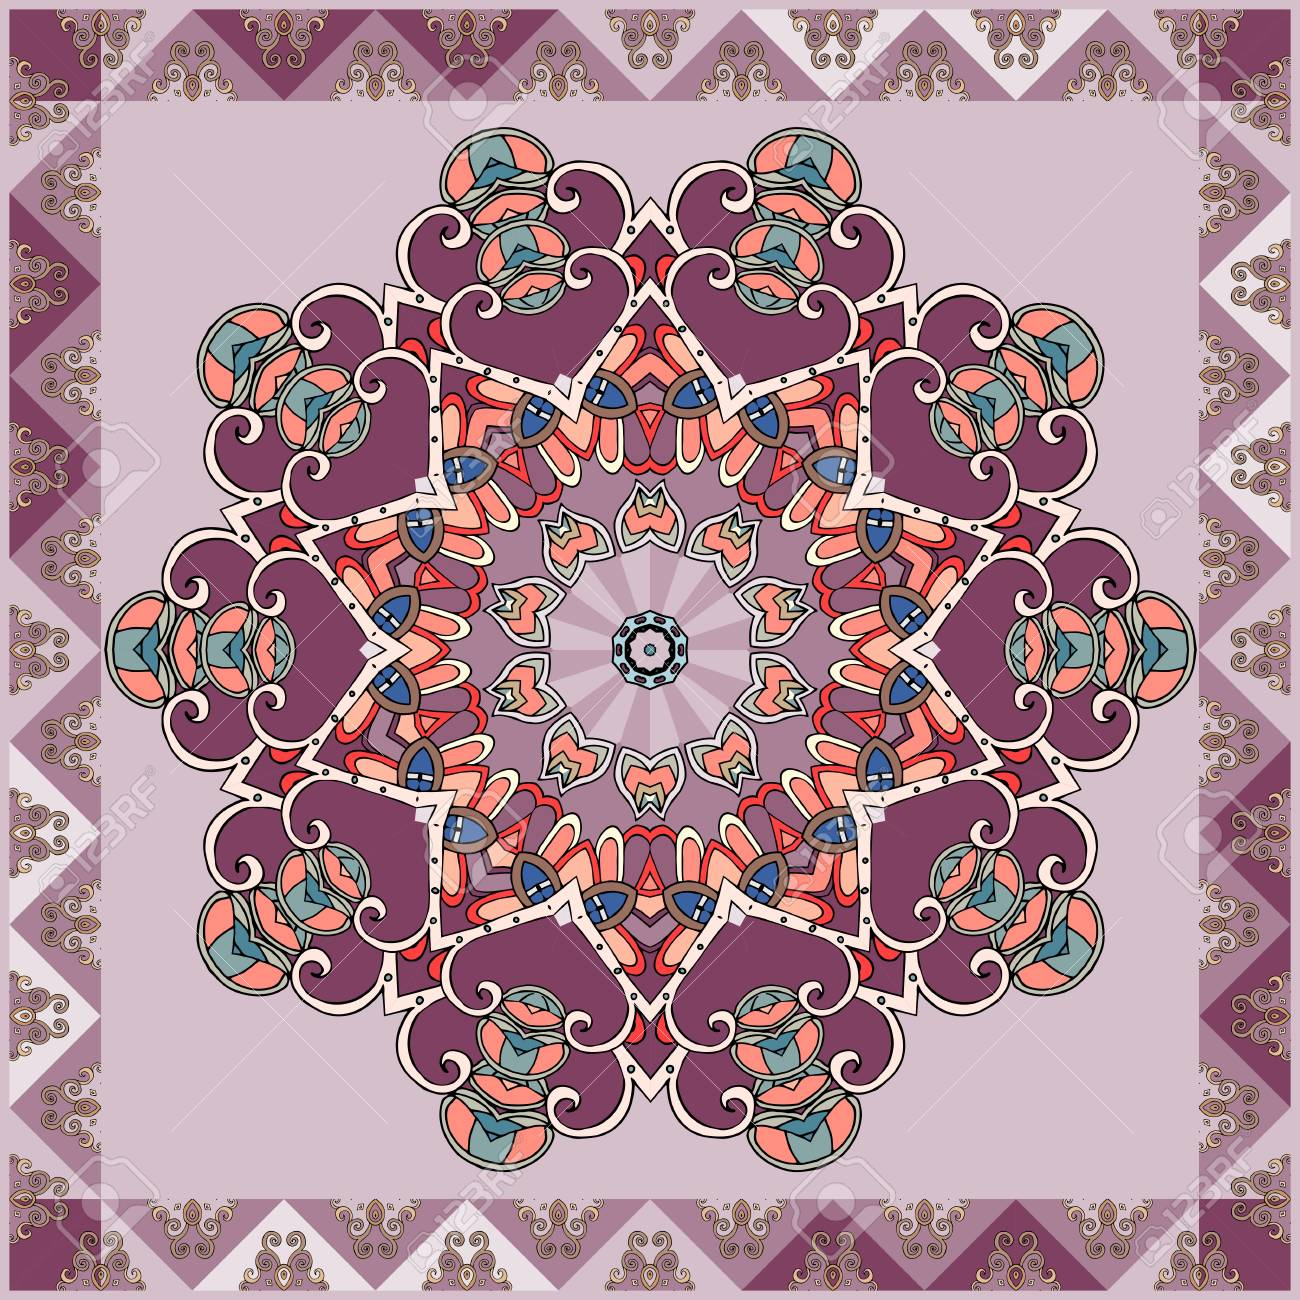 Hermosa Servilleta O Alfombra Cuadrada Con Mandala De Flores De